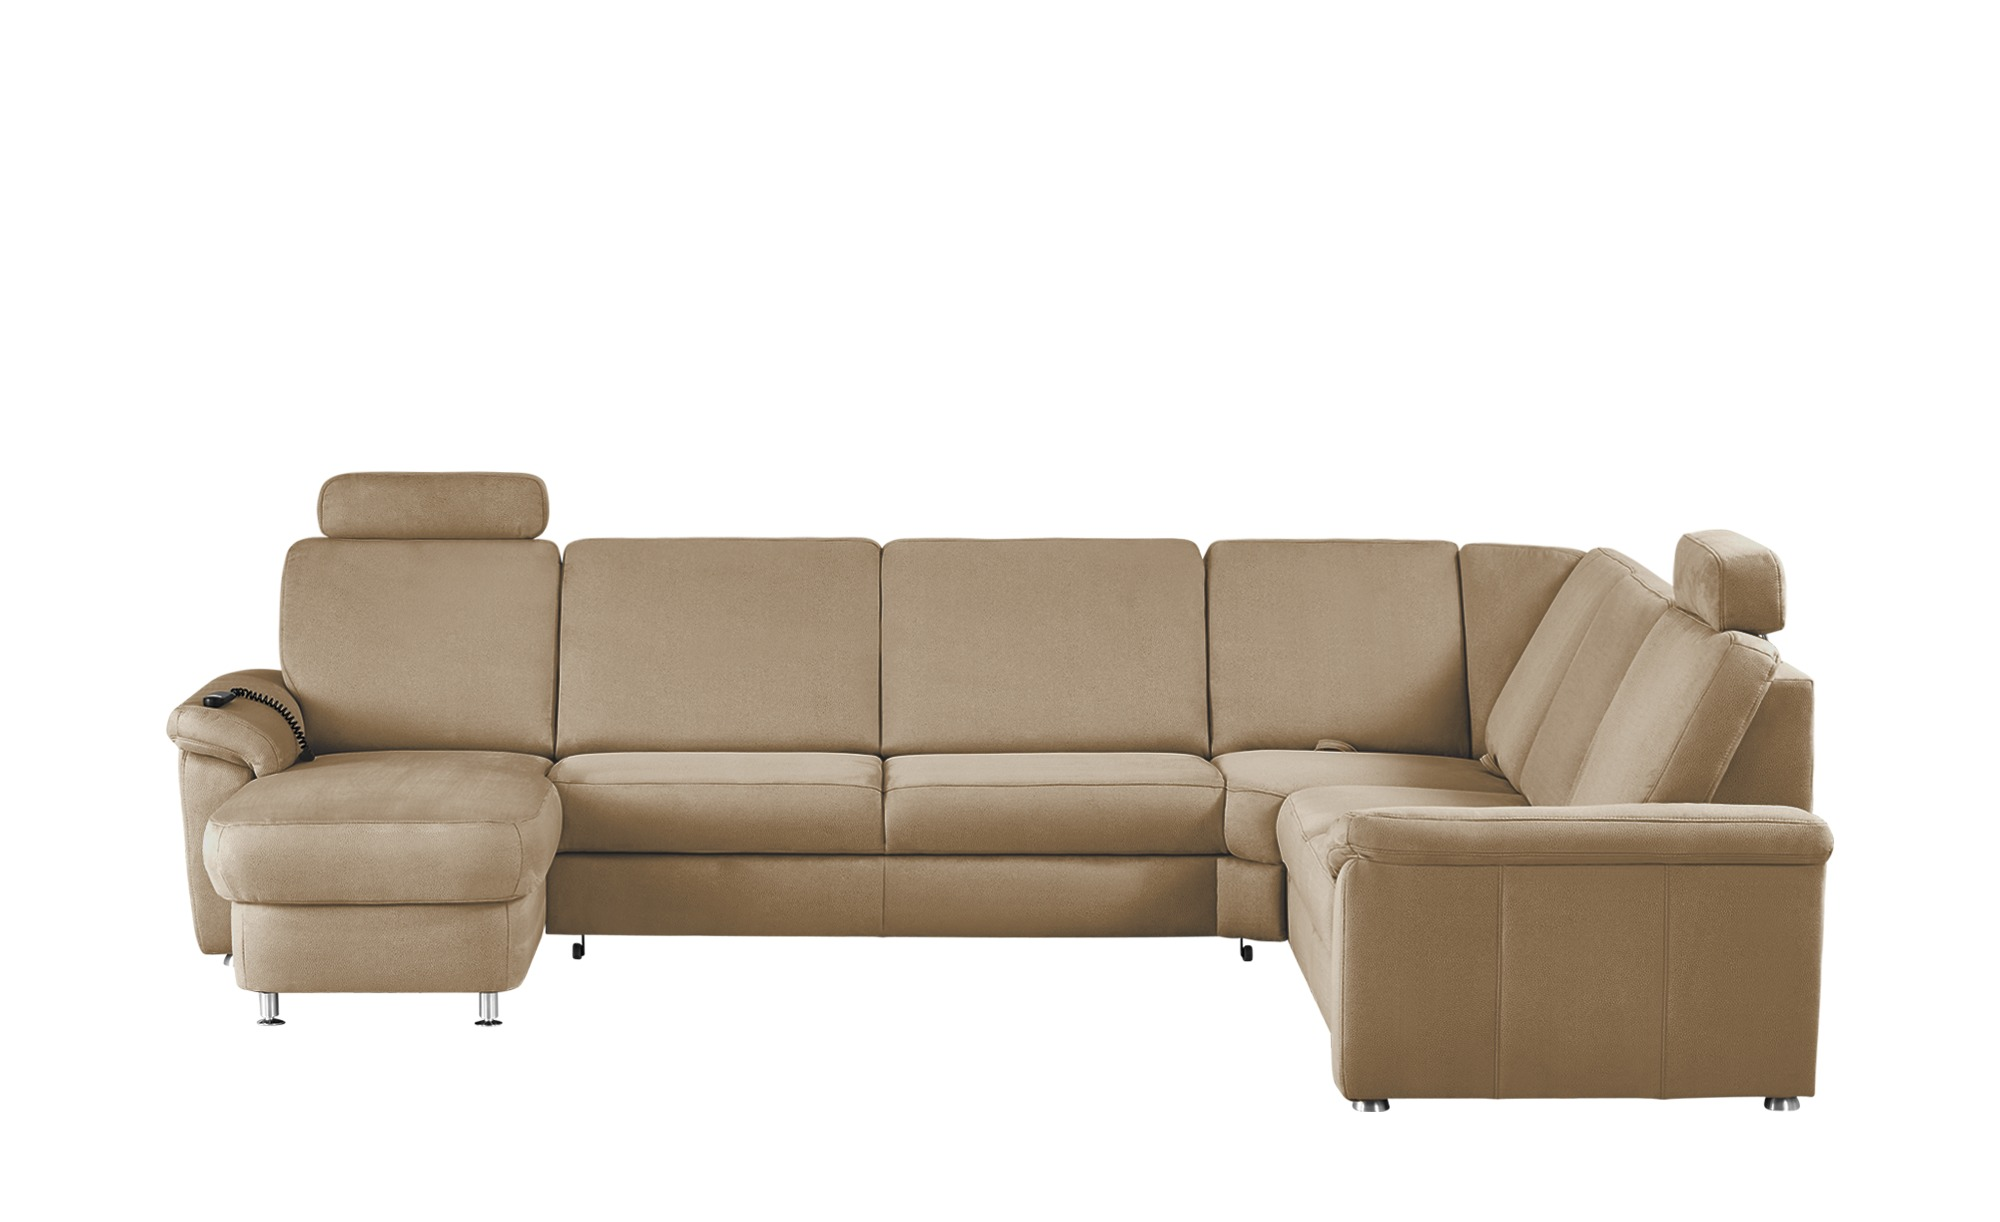 meinsofa wohnlandschaft rita breite h he 91 cm beige. Black Bedroom Furniture Sets. Home Design Ideas